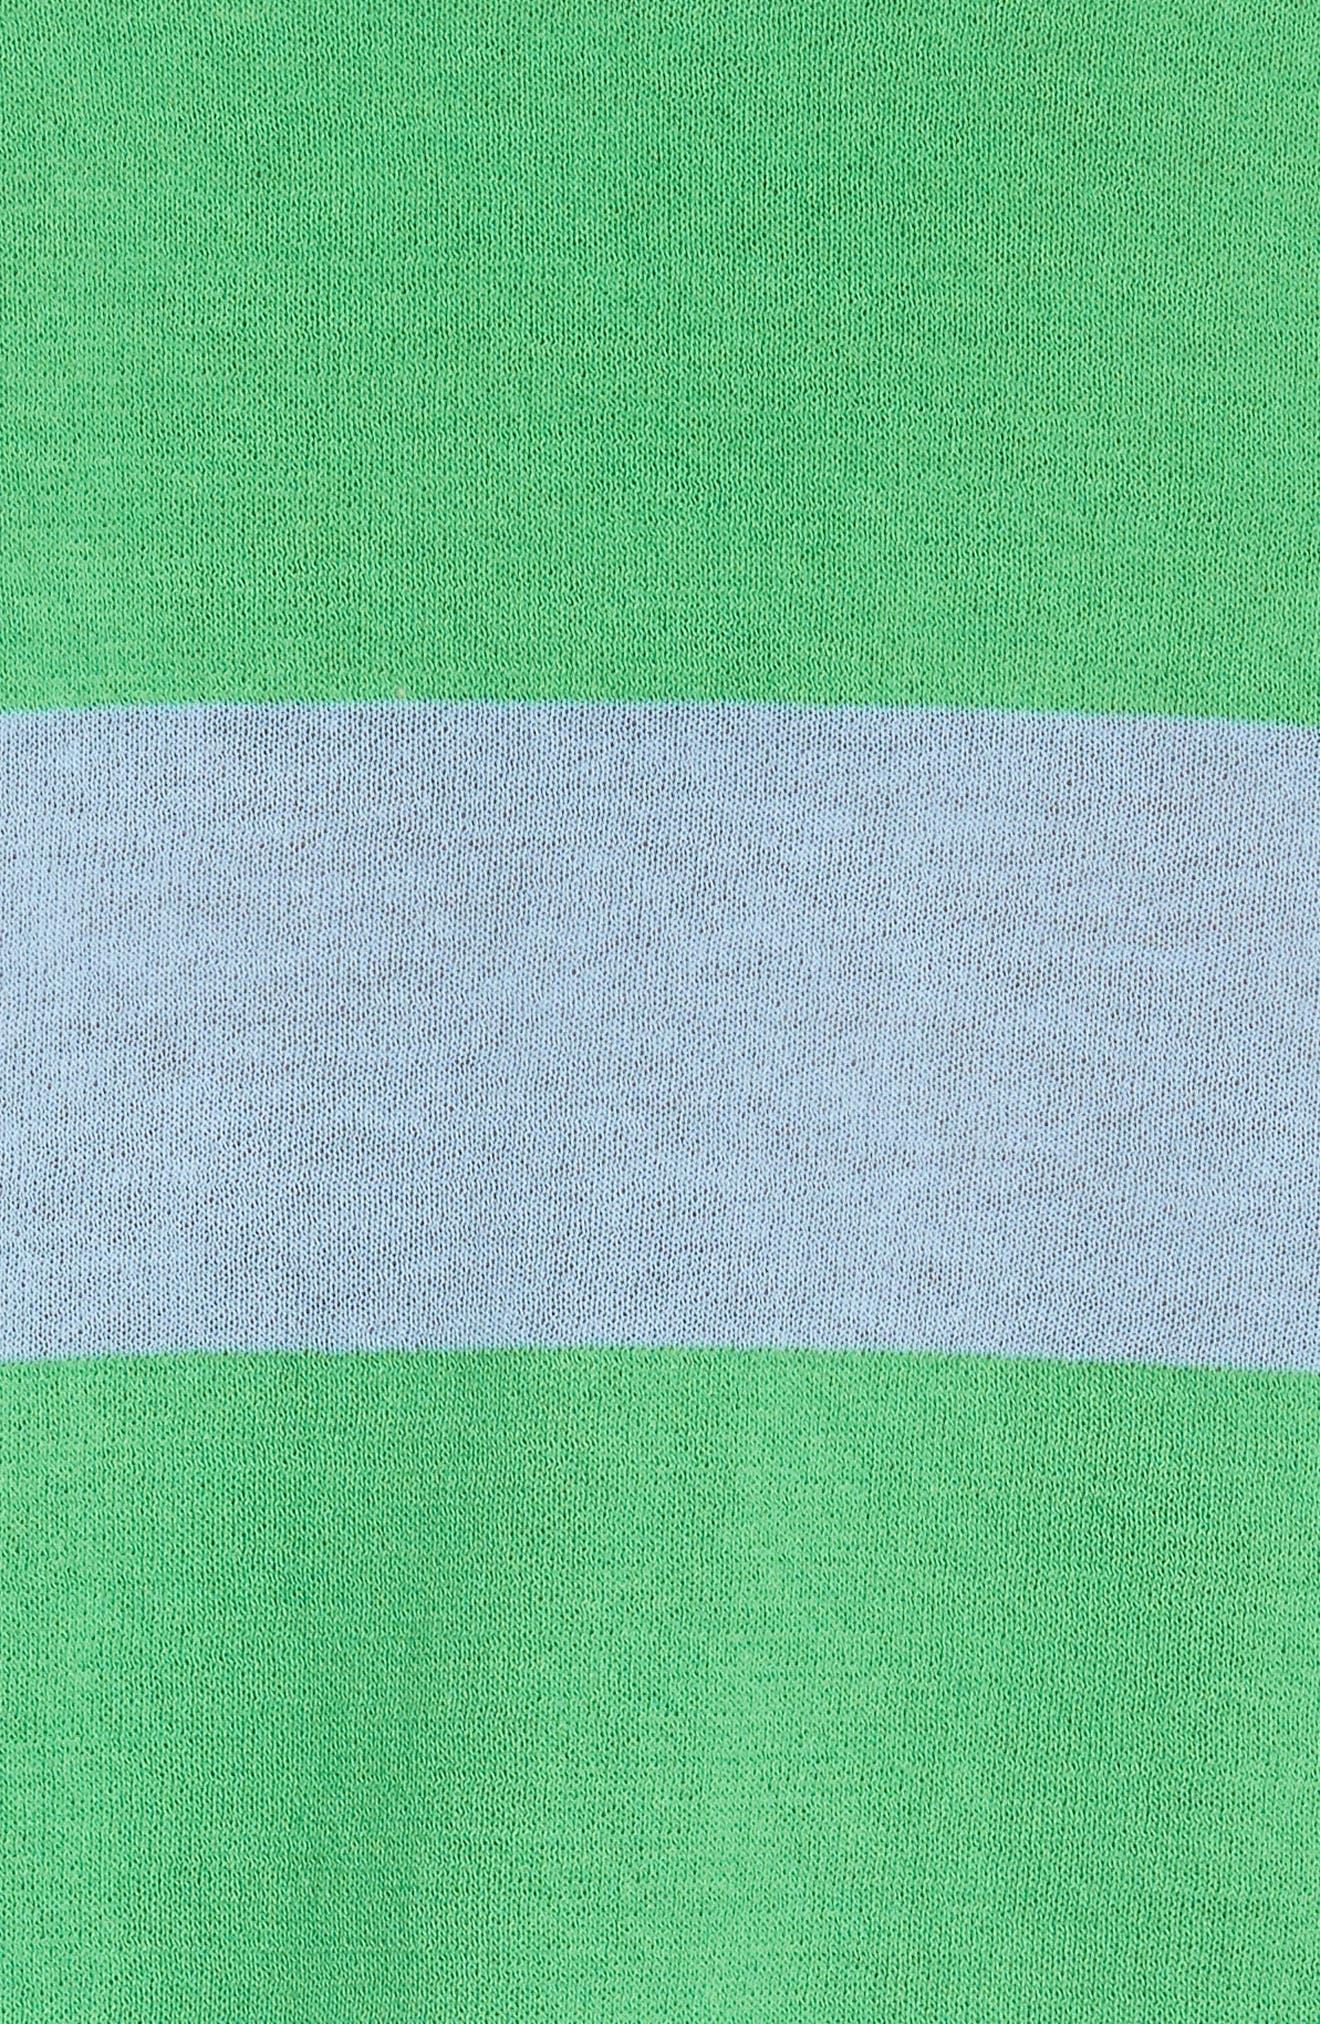 Diane von Furstenberg Colorblock Stripe Sweater,                             Alternate thumbnail 5, color,                             415